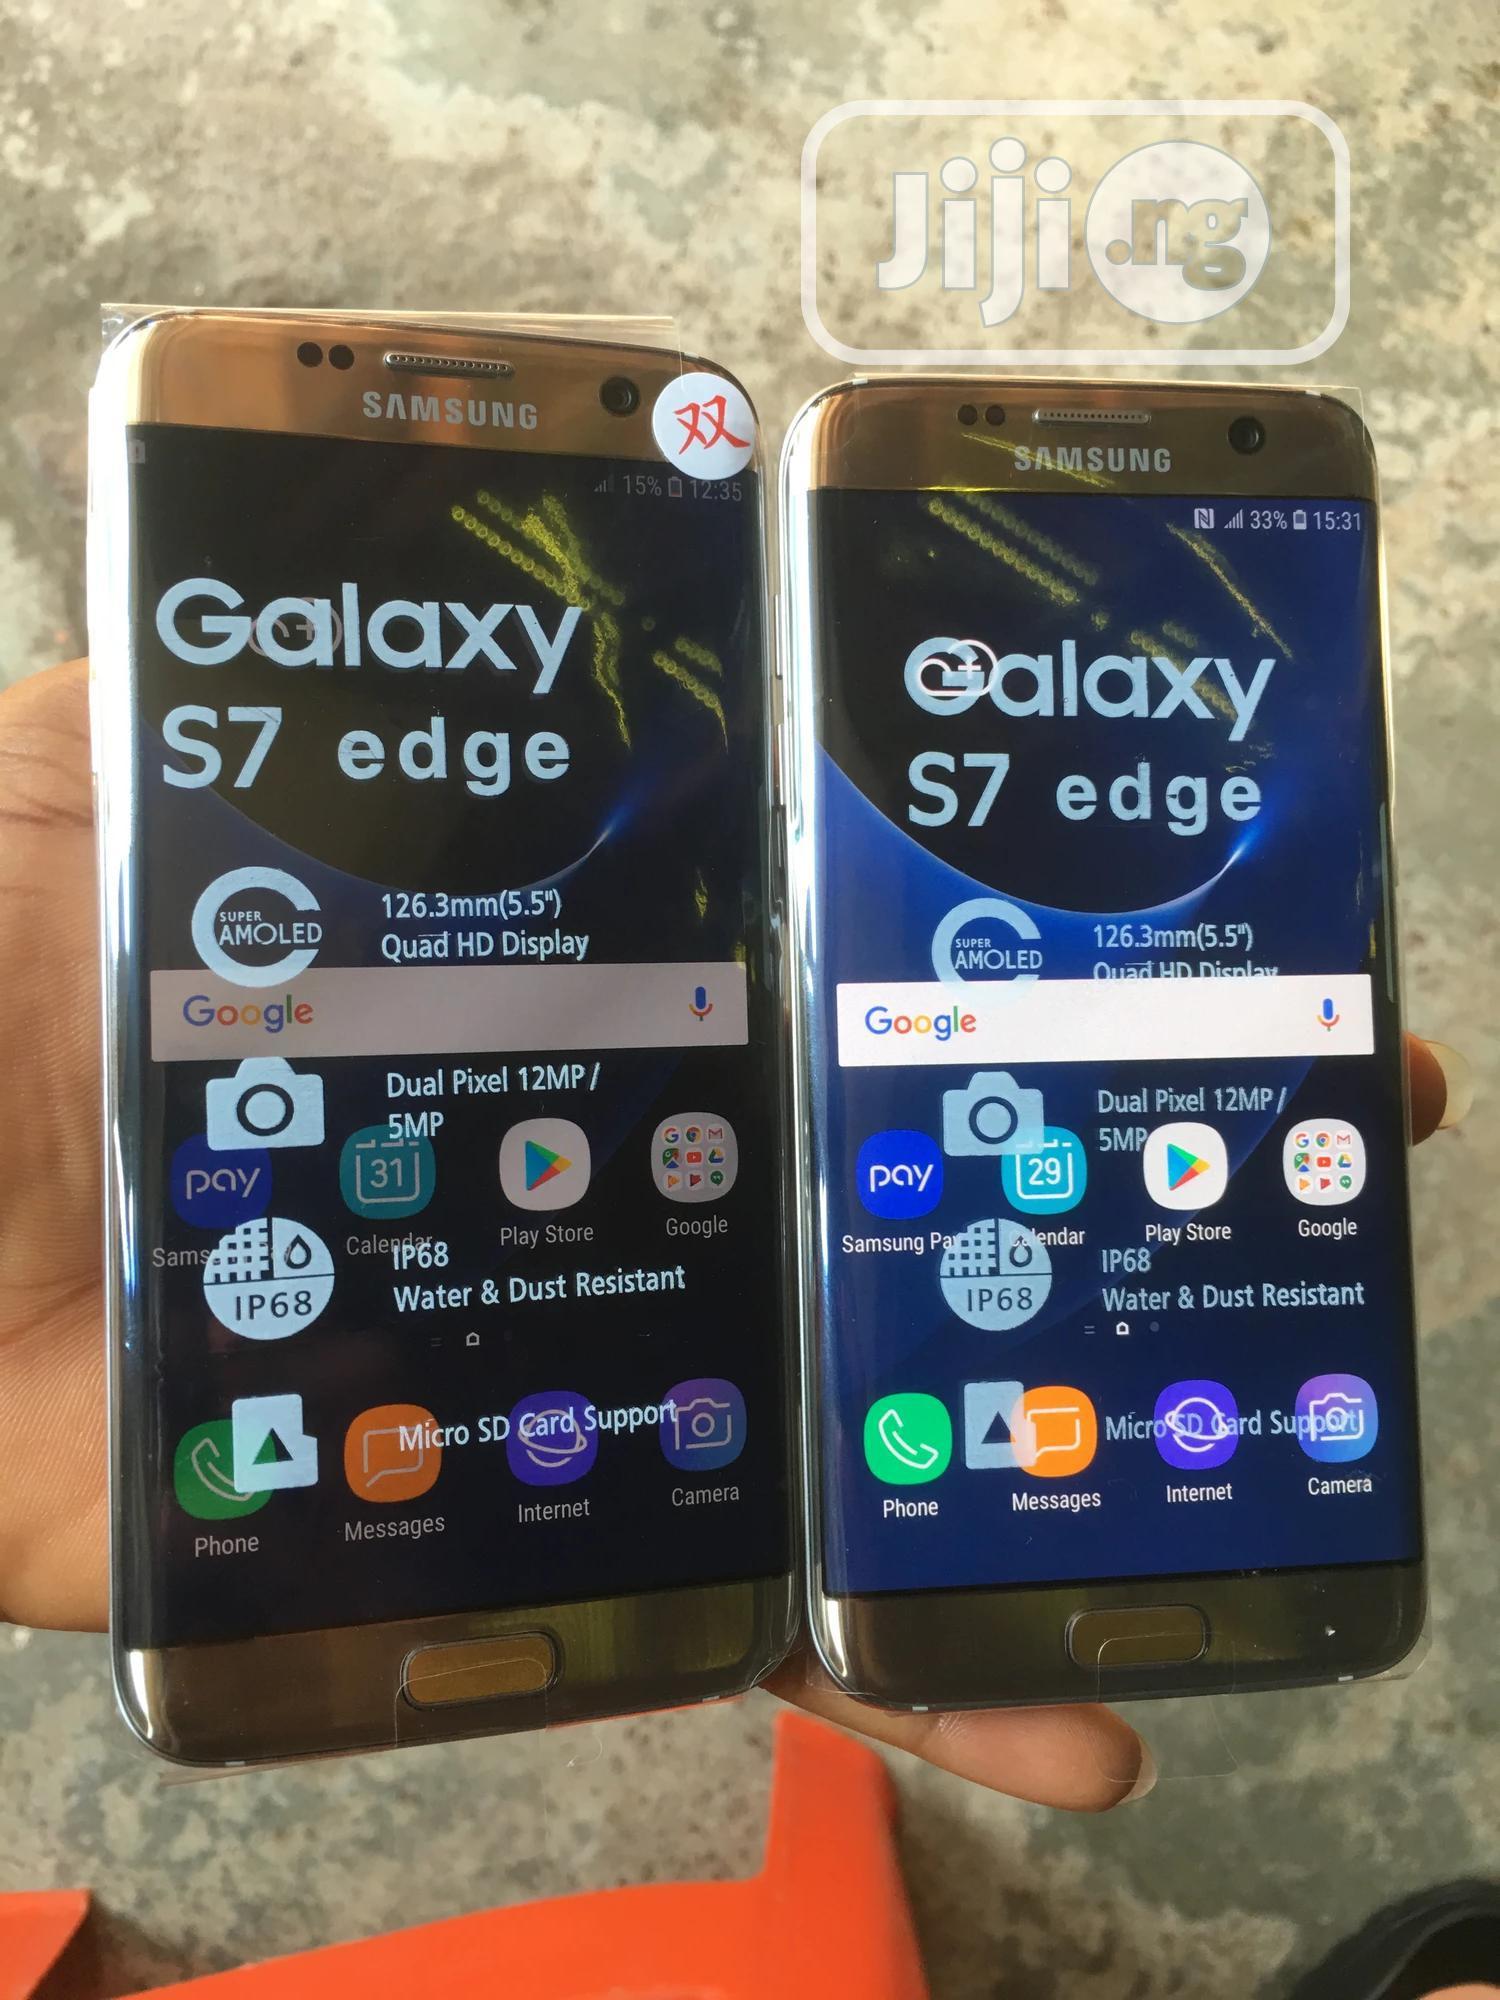 Samsung Galaxy S7 edge 32 GB Gold